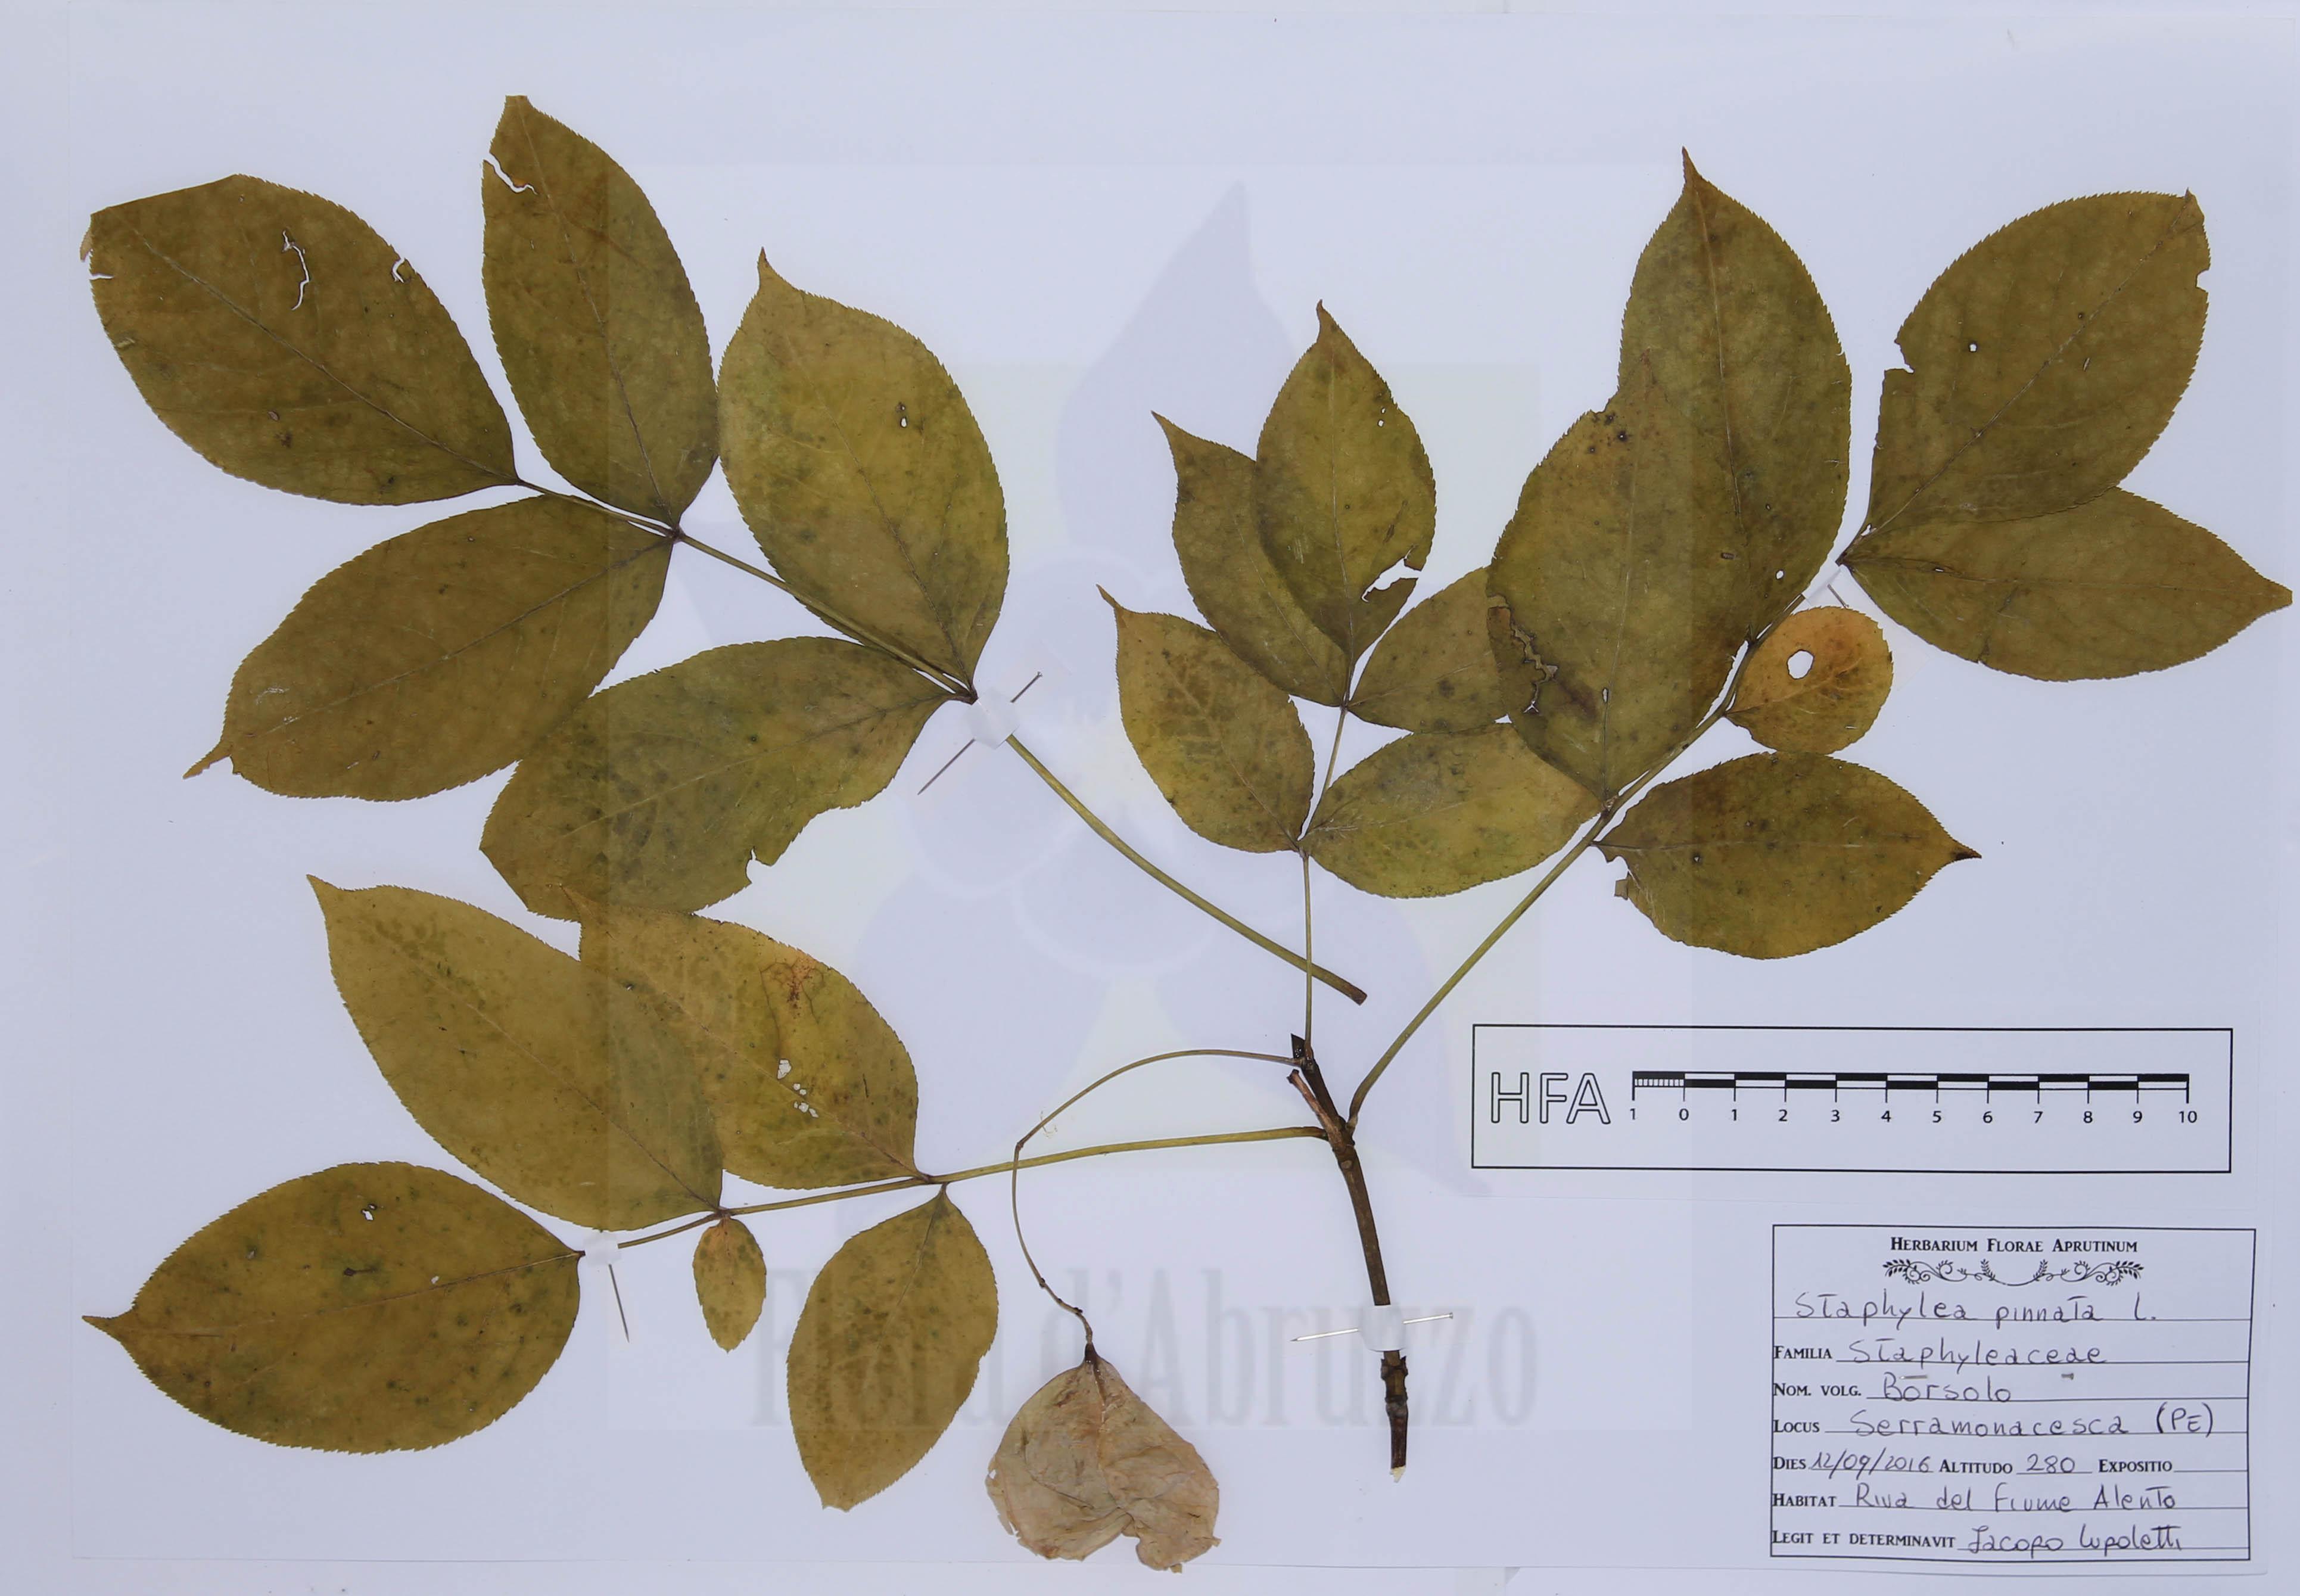 Staphylea pinnata L.